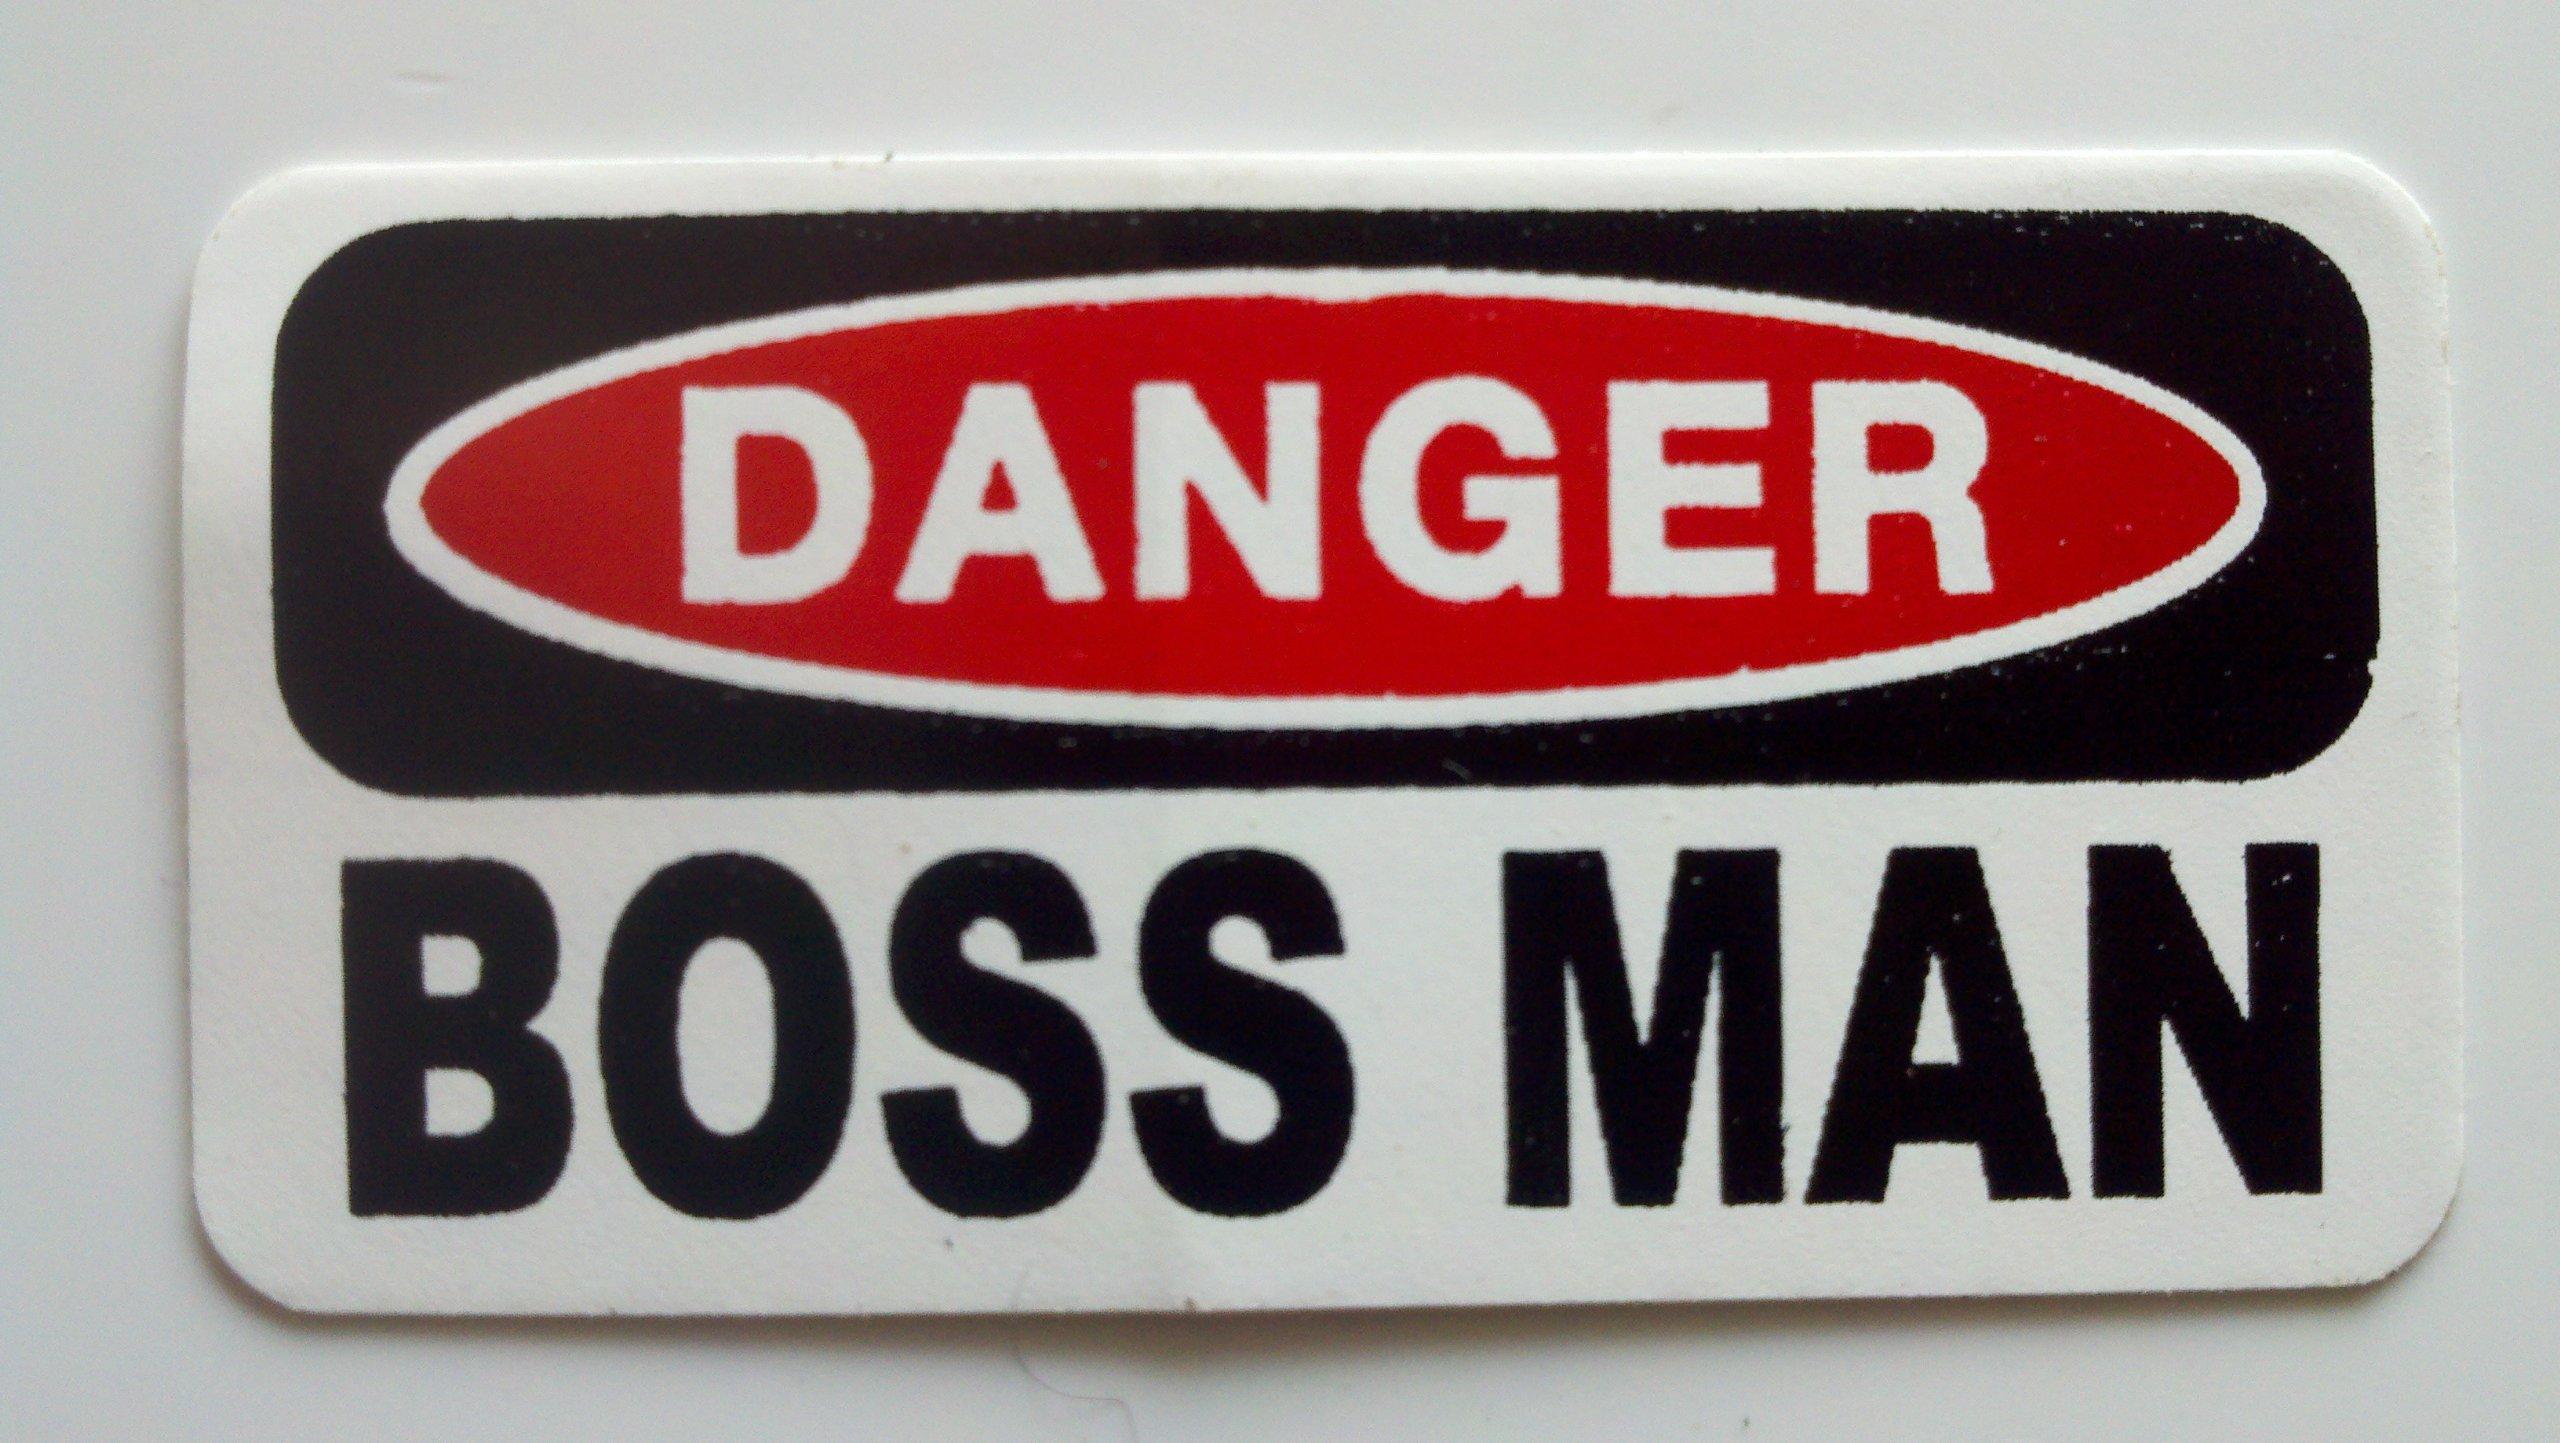 "3 - Danger Boss Man Hard Hat/Helmet Stickers 1"" x 2"" by StickerPirate (Image #3)"